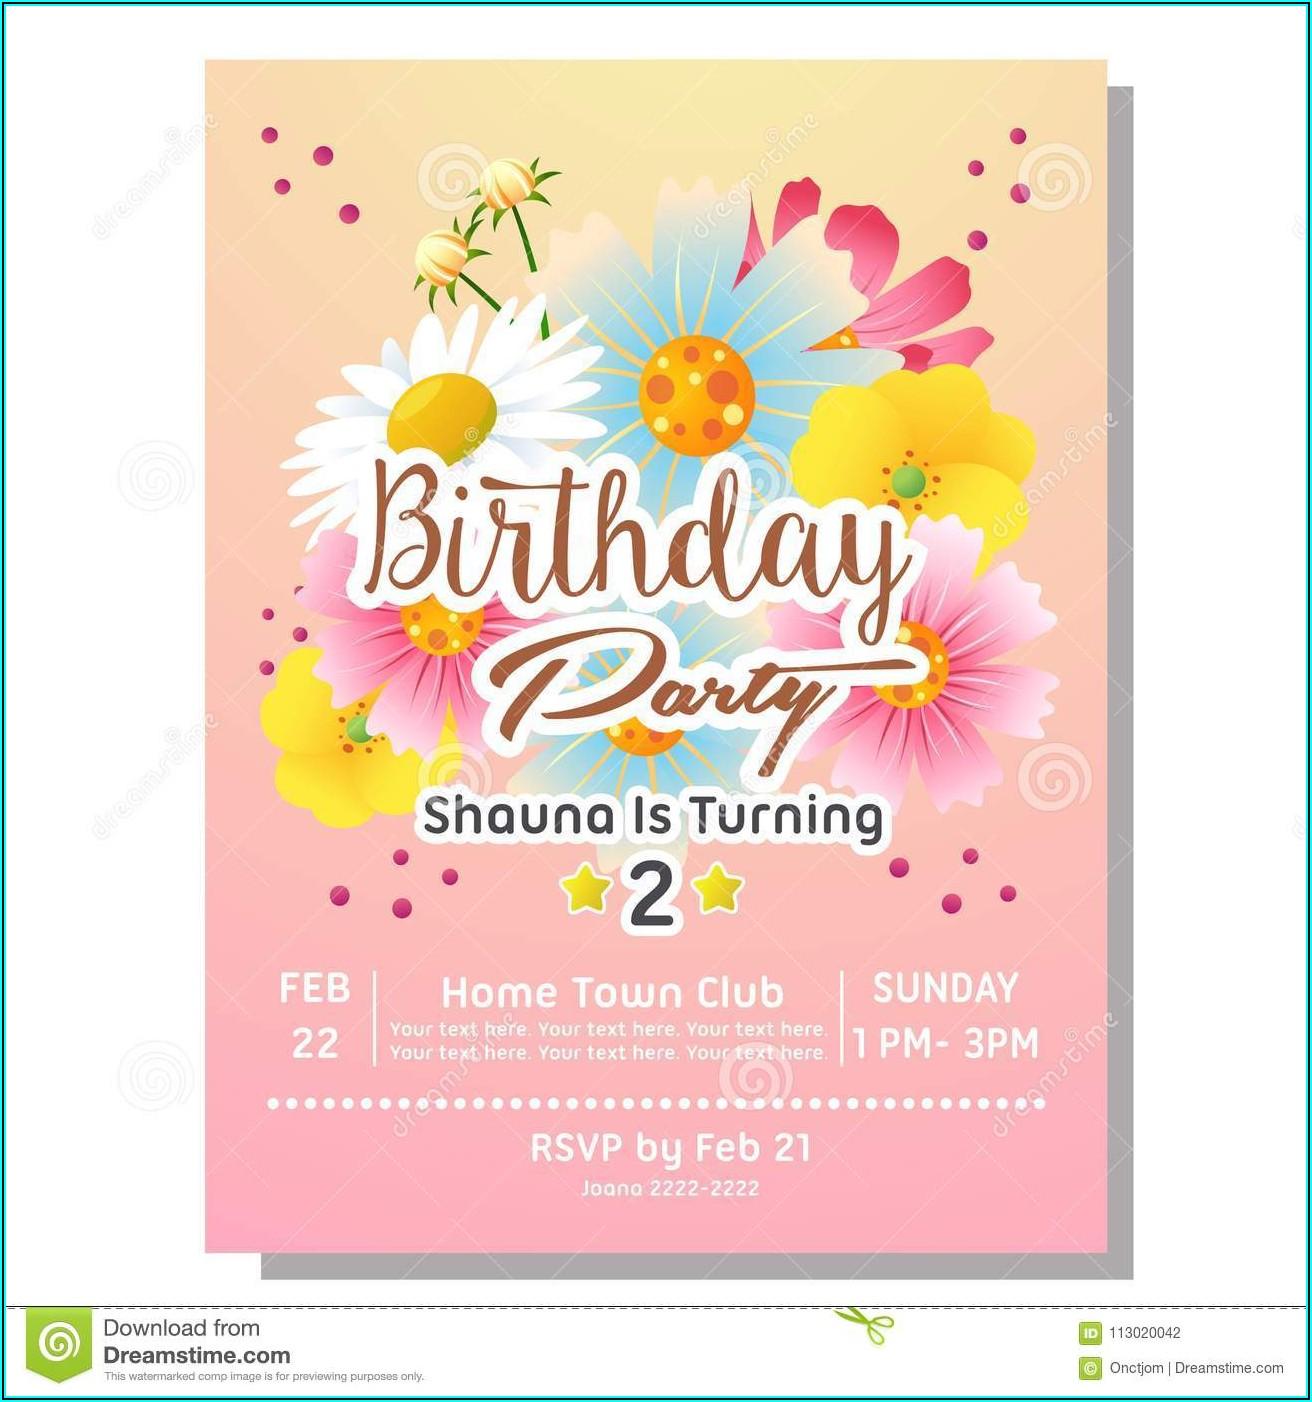 Flower Birthday Party Invitation Template